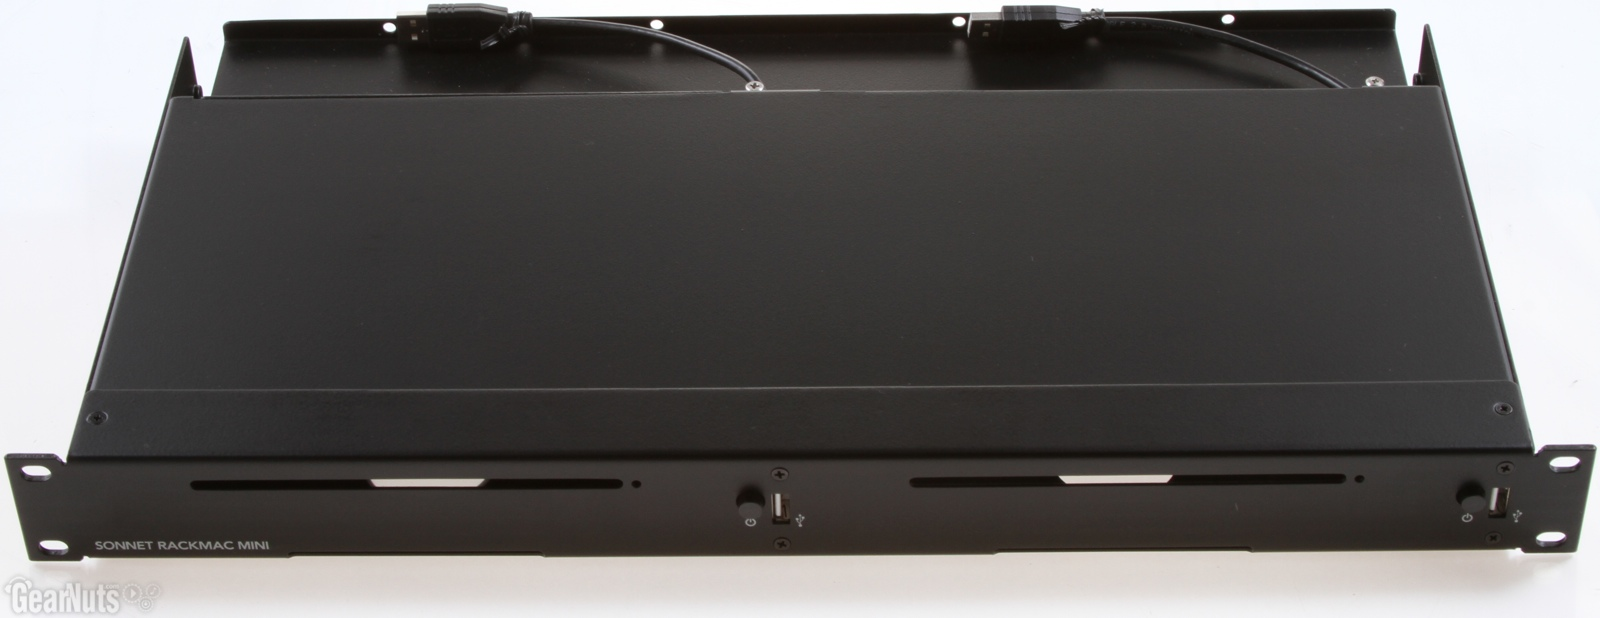 Sonnet RackMac mini